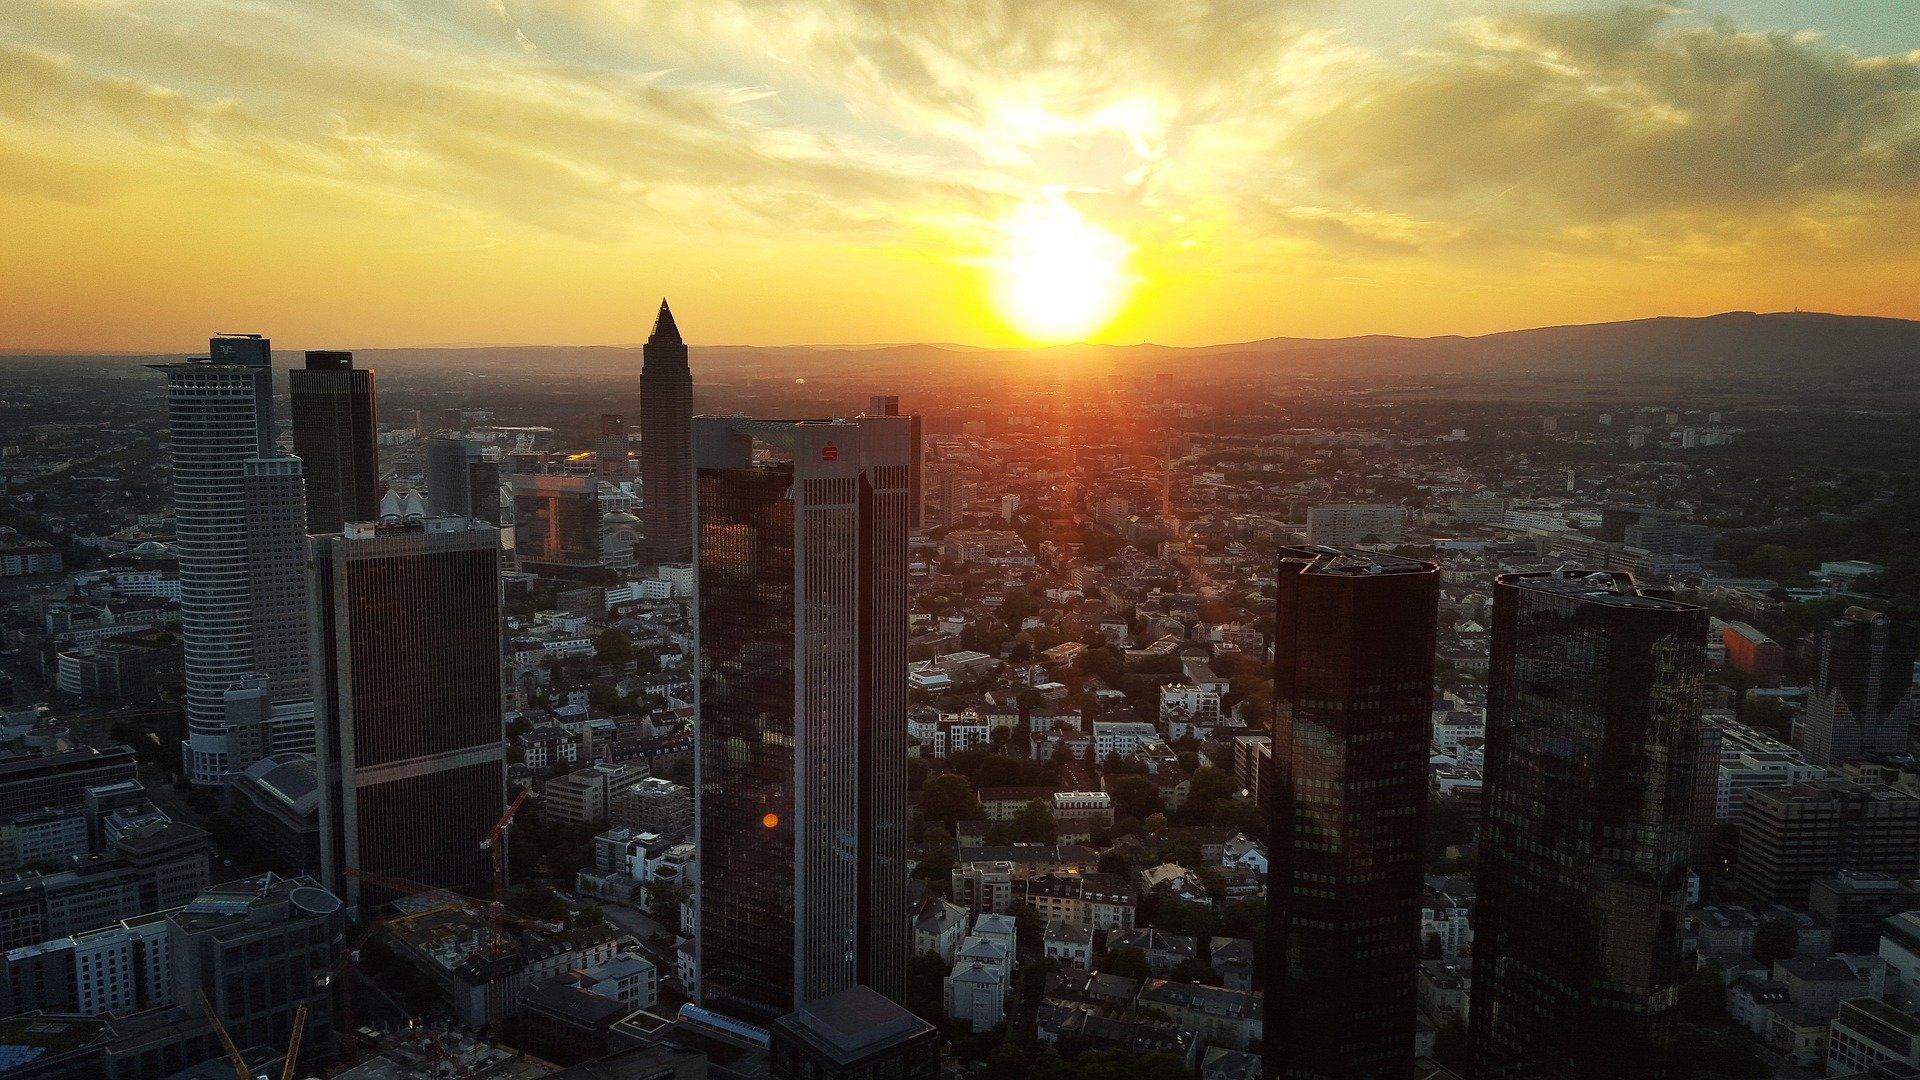 Corona-Krise trifft Standort Frankfurt massiv